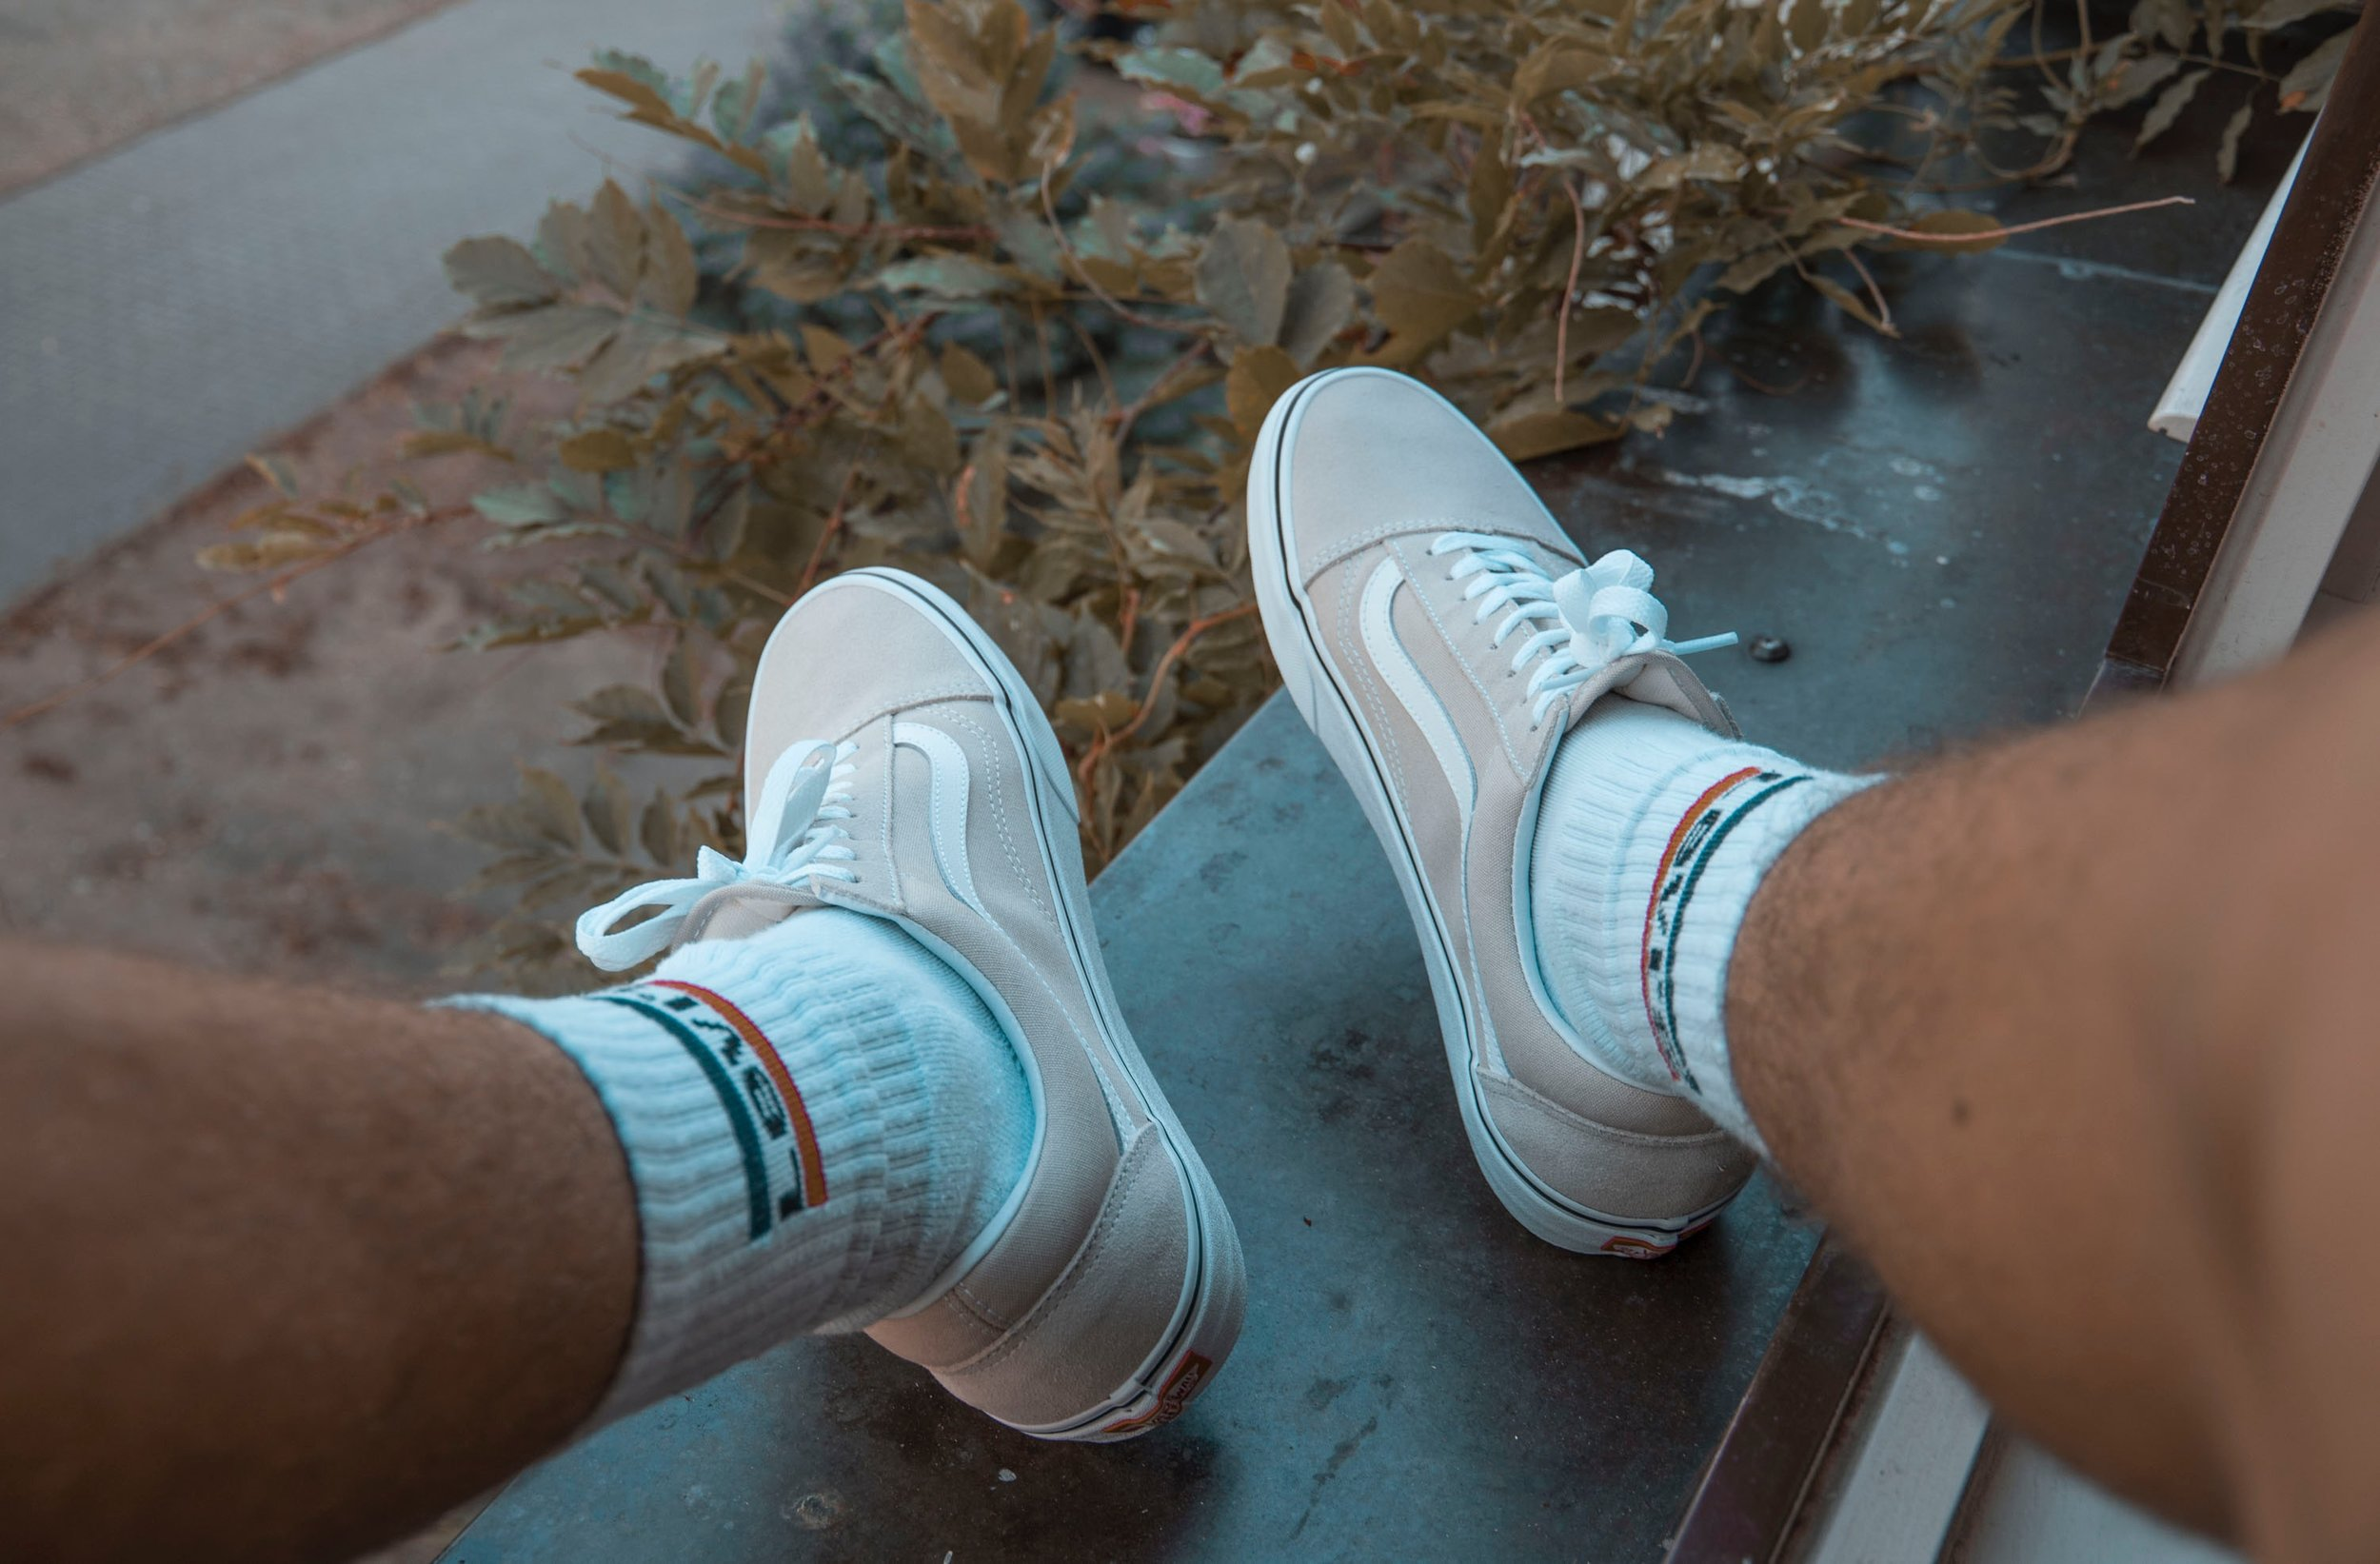 daylight-fashion-footwear-1365756.jpg